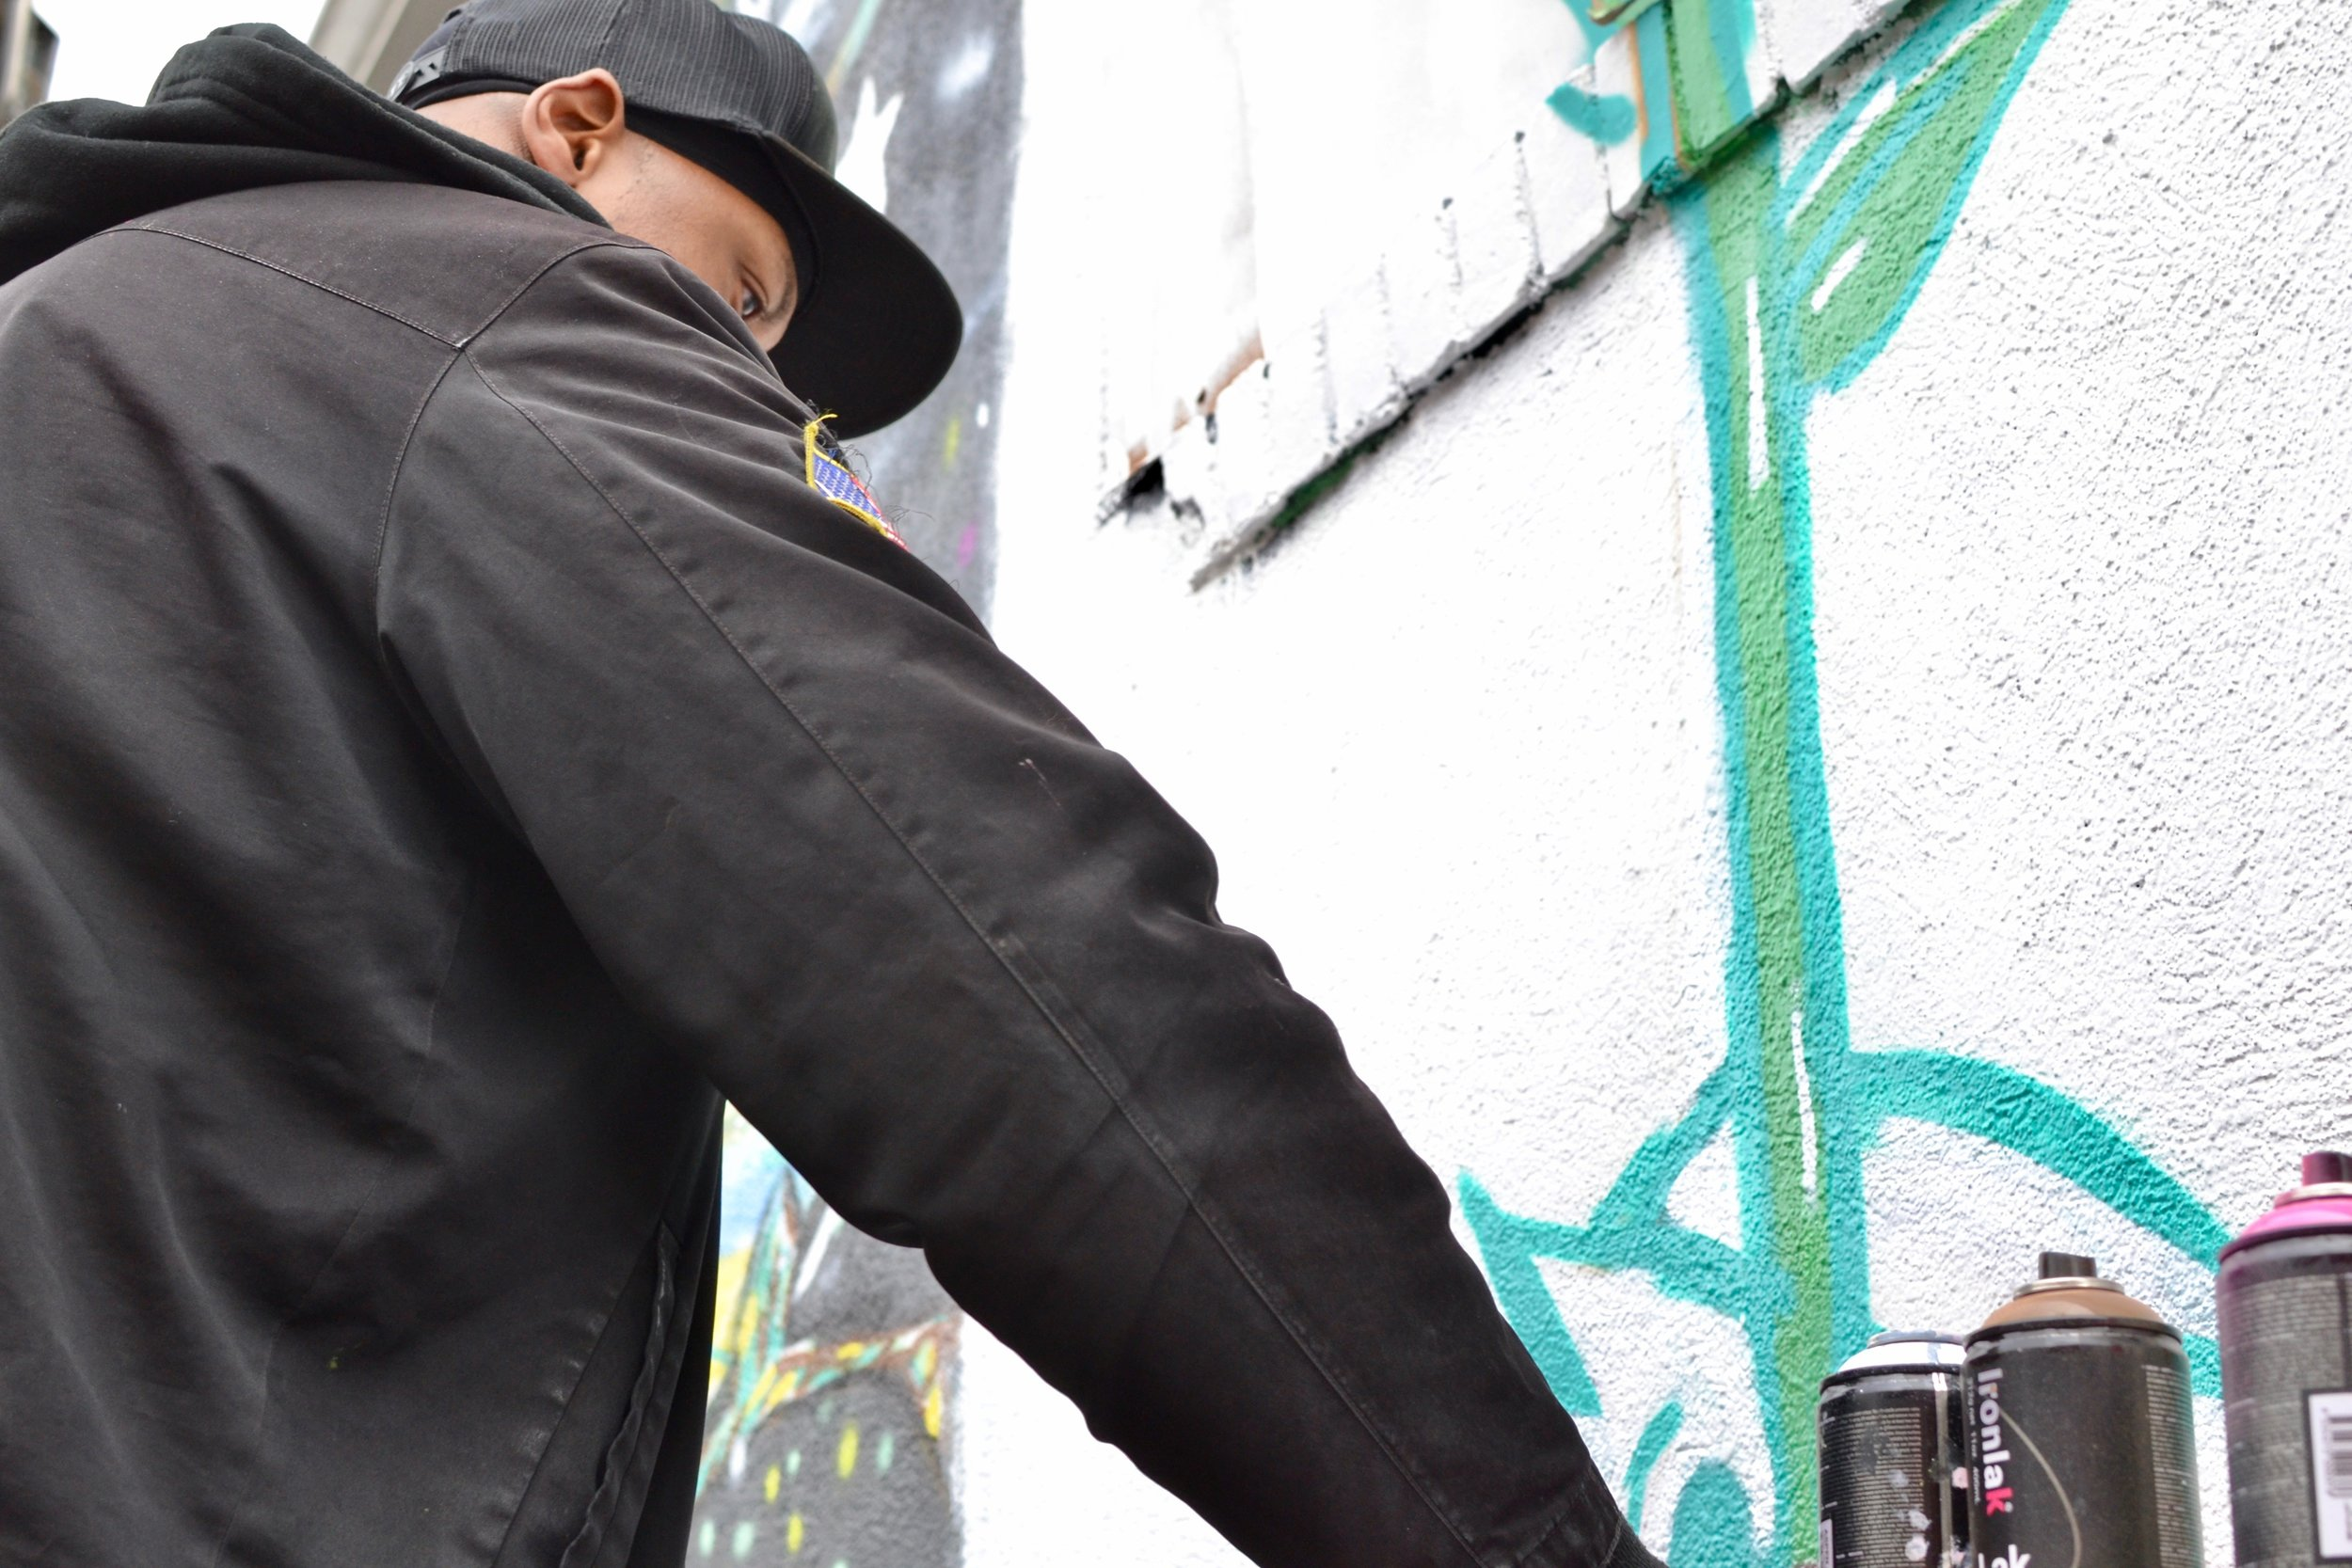 Robert Wright for Stain'd Arts' interview with artist series, denver muralist3.jpeg